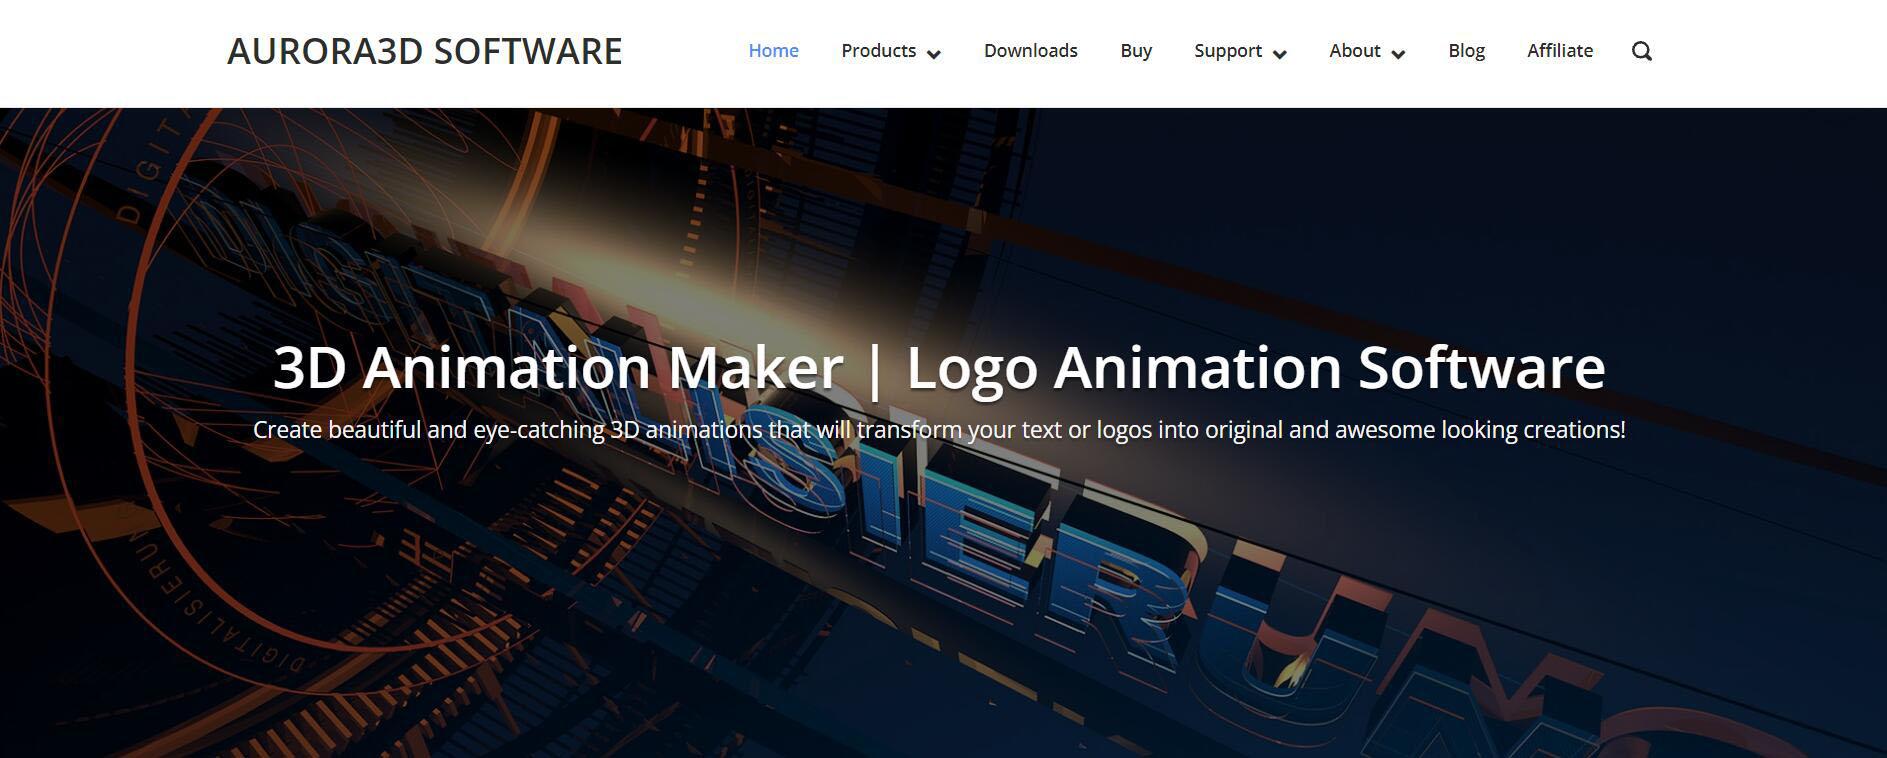 Aurora3D Software Affiliate Program